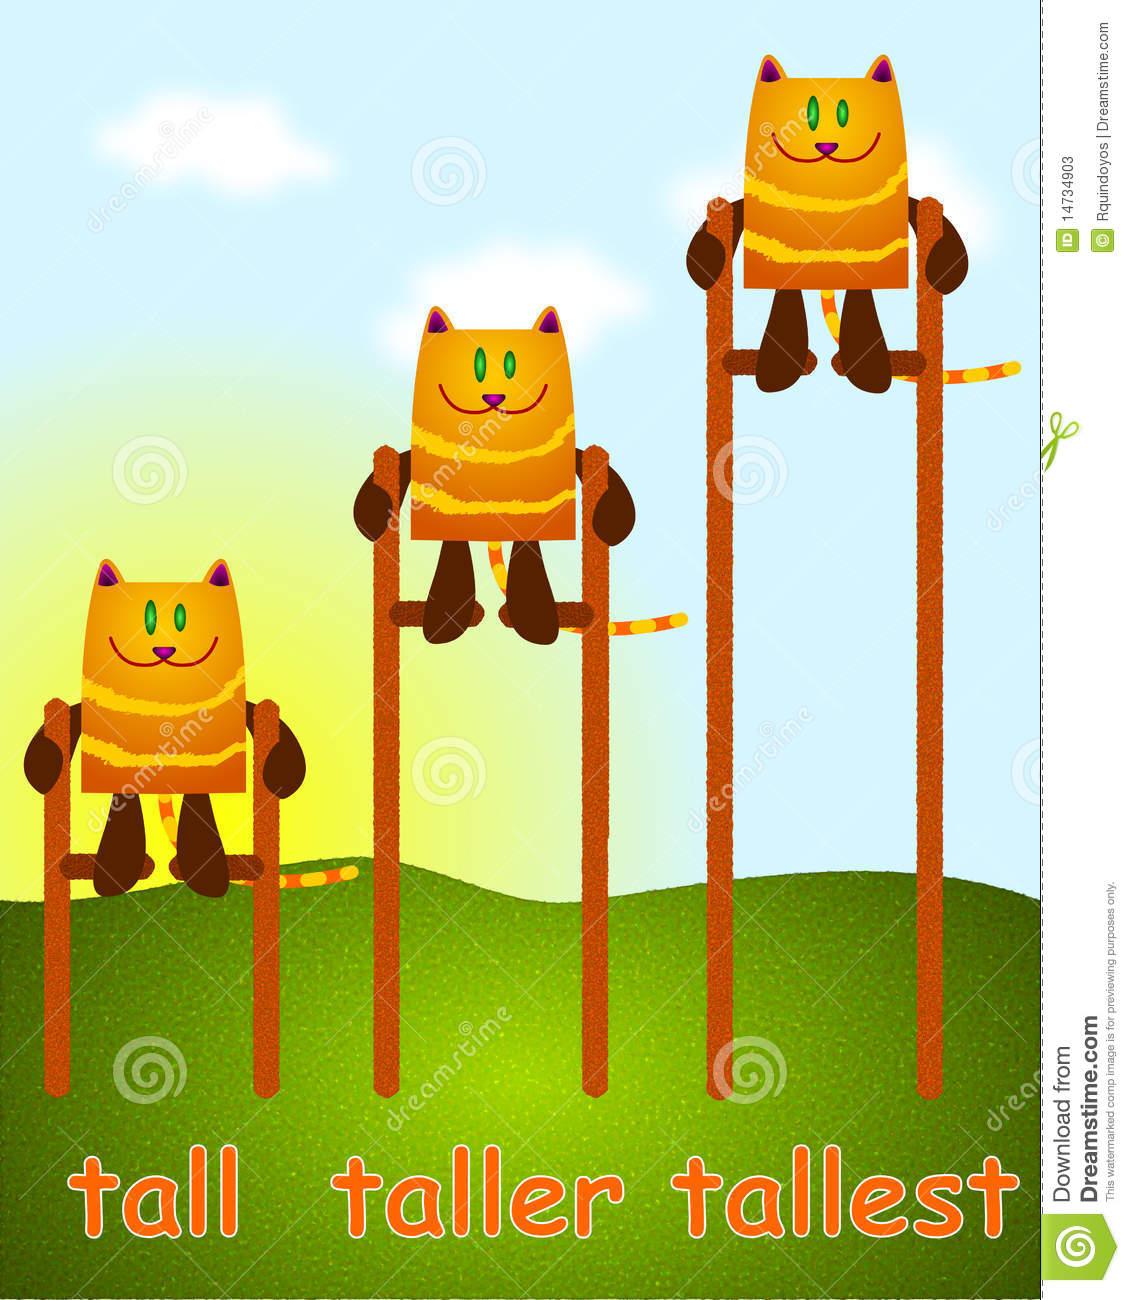 Tallest Clipart (26+).